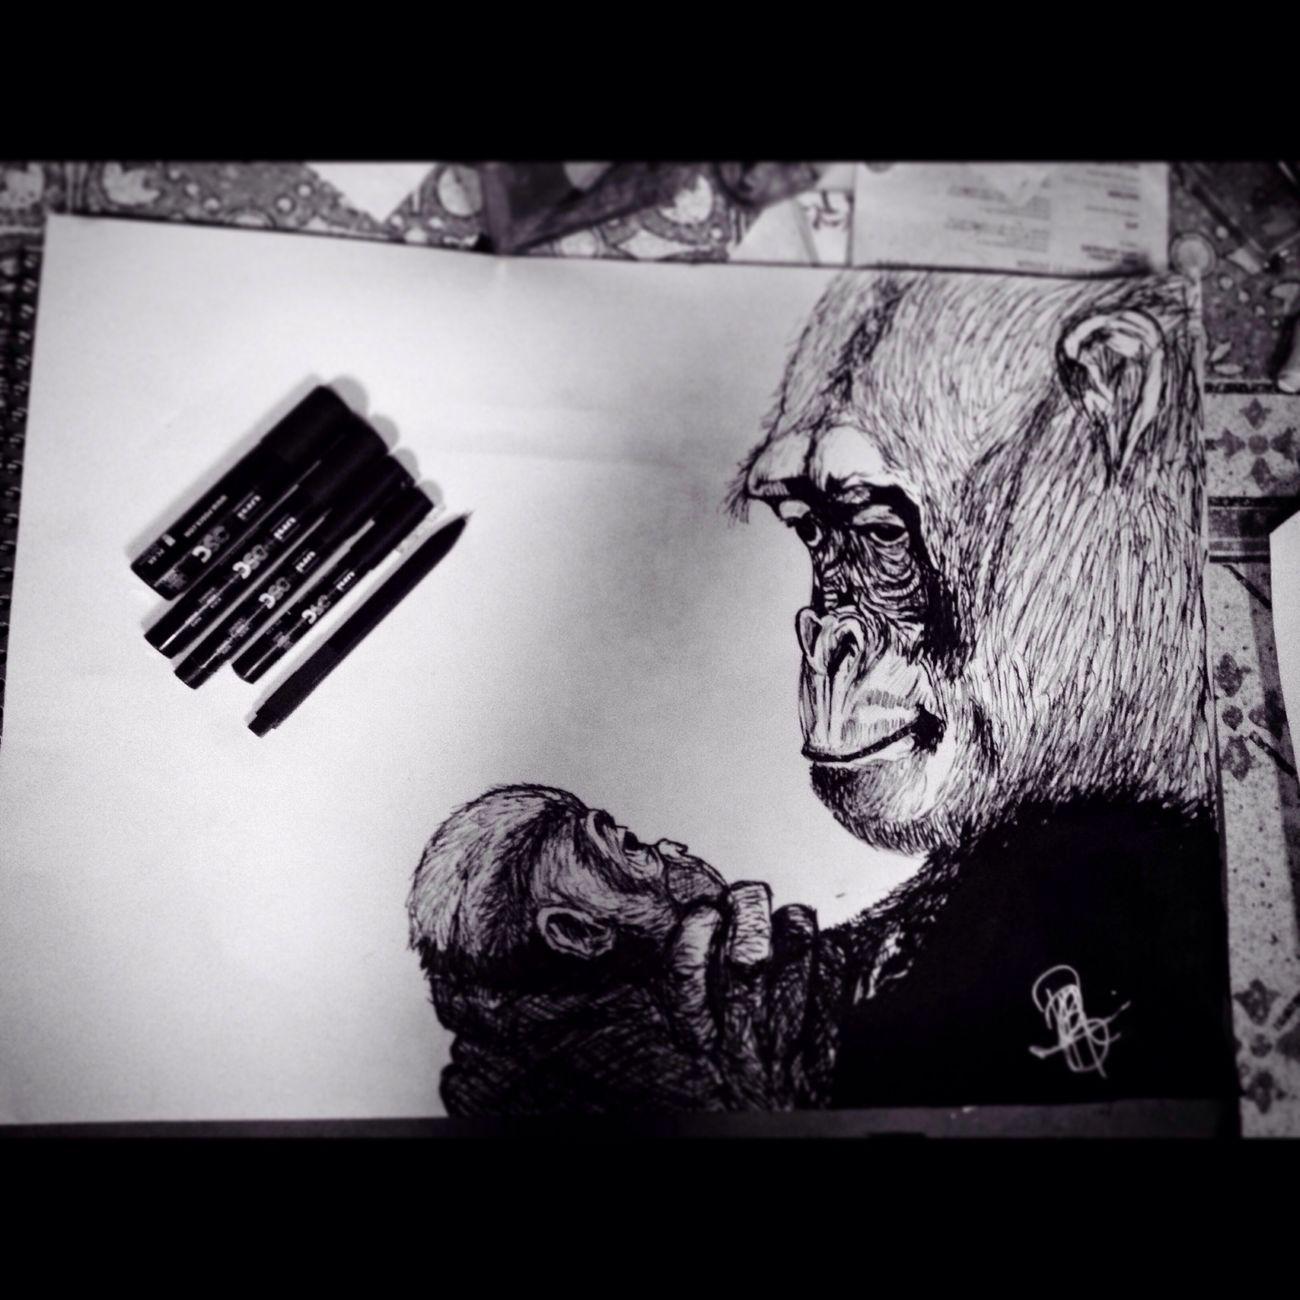 Art, Drawing, Creativity Drawings Art Animals Monkeys French Girl Hello World Enjoying Life Blackandwhite Beautifull